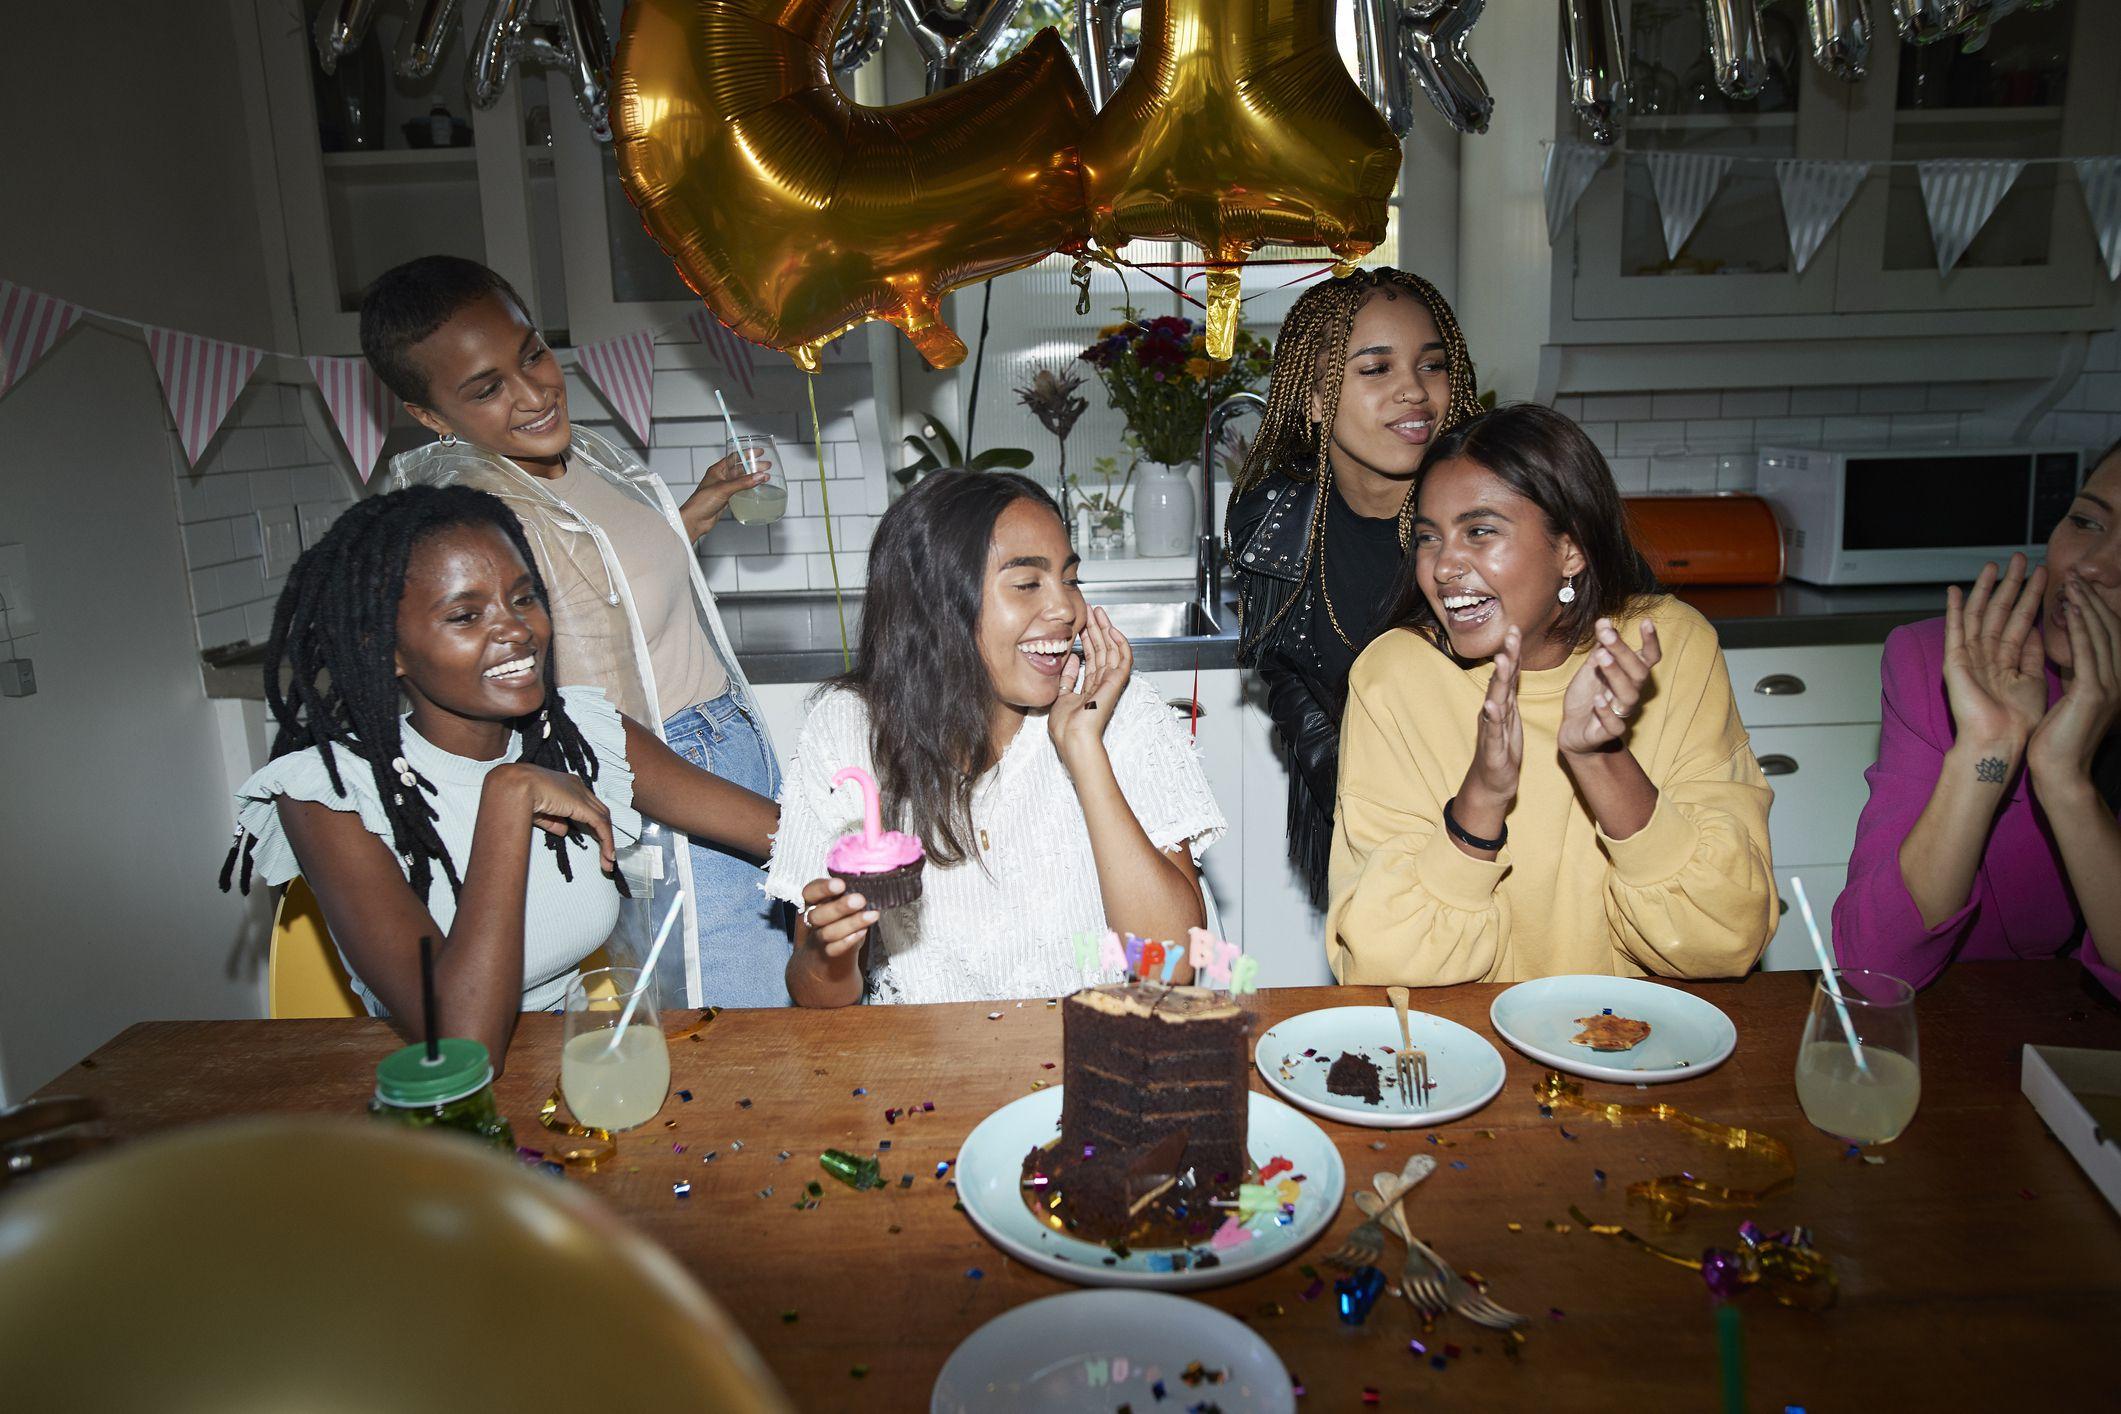 15 Ways To Celebrate A 21st Birthday Party